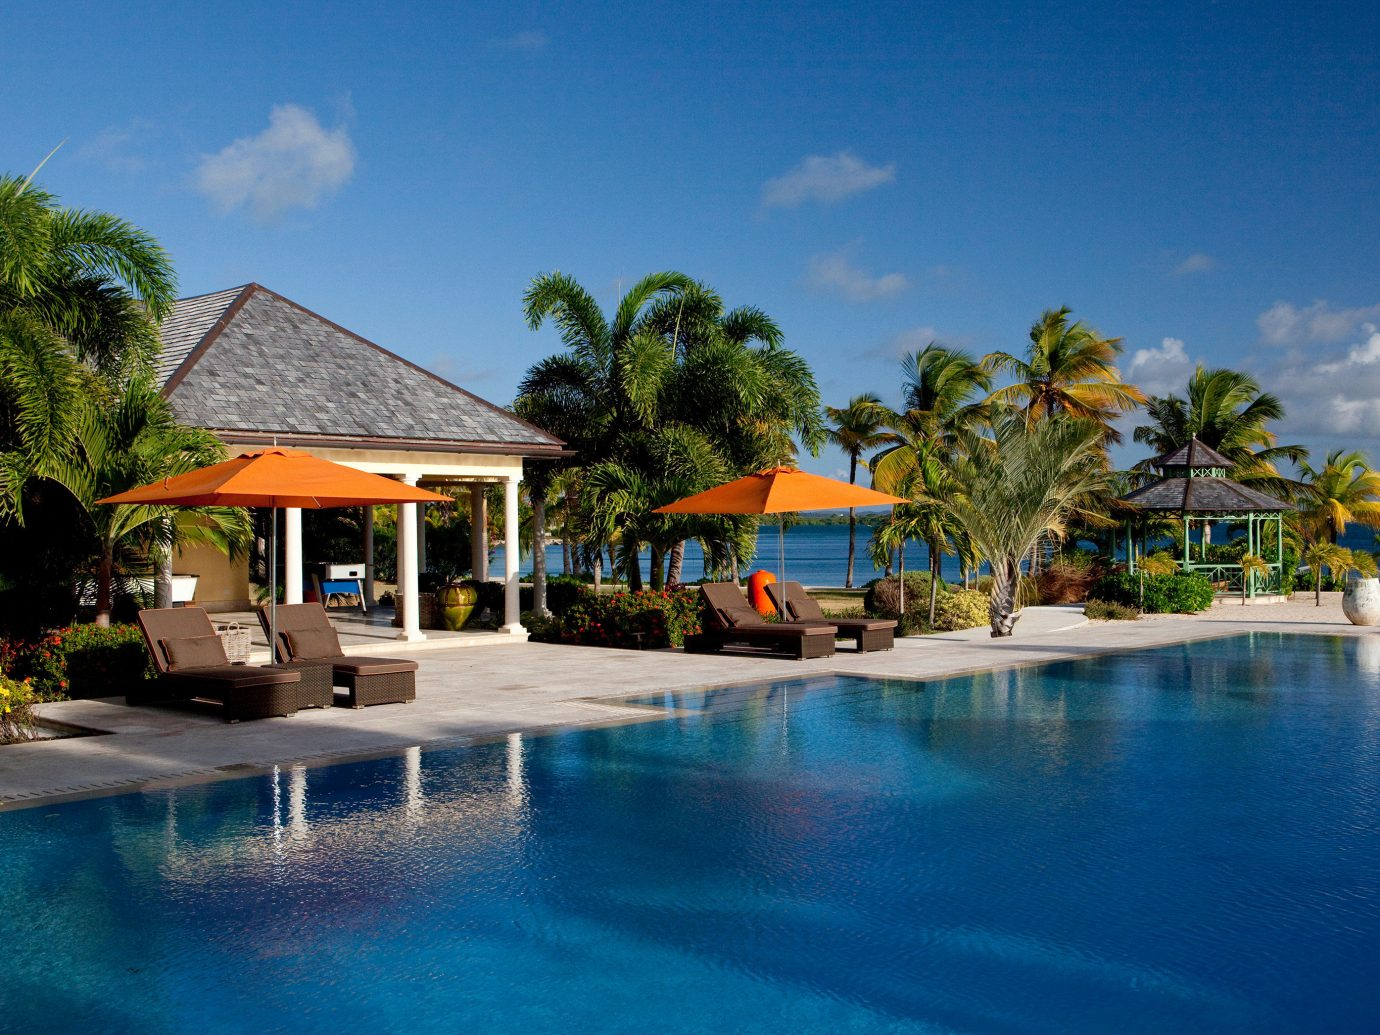 Pool at Jumby Bay Island, Antigua, Caribbean